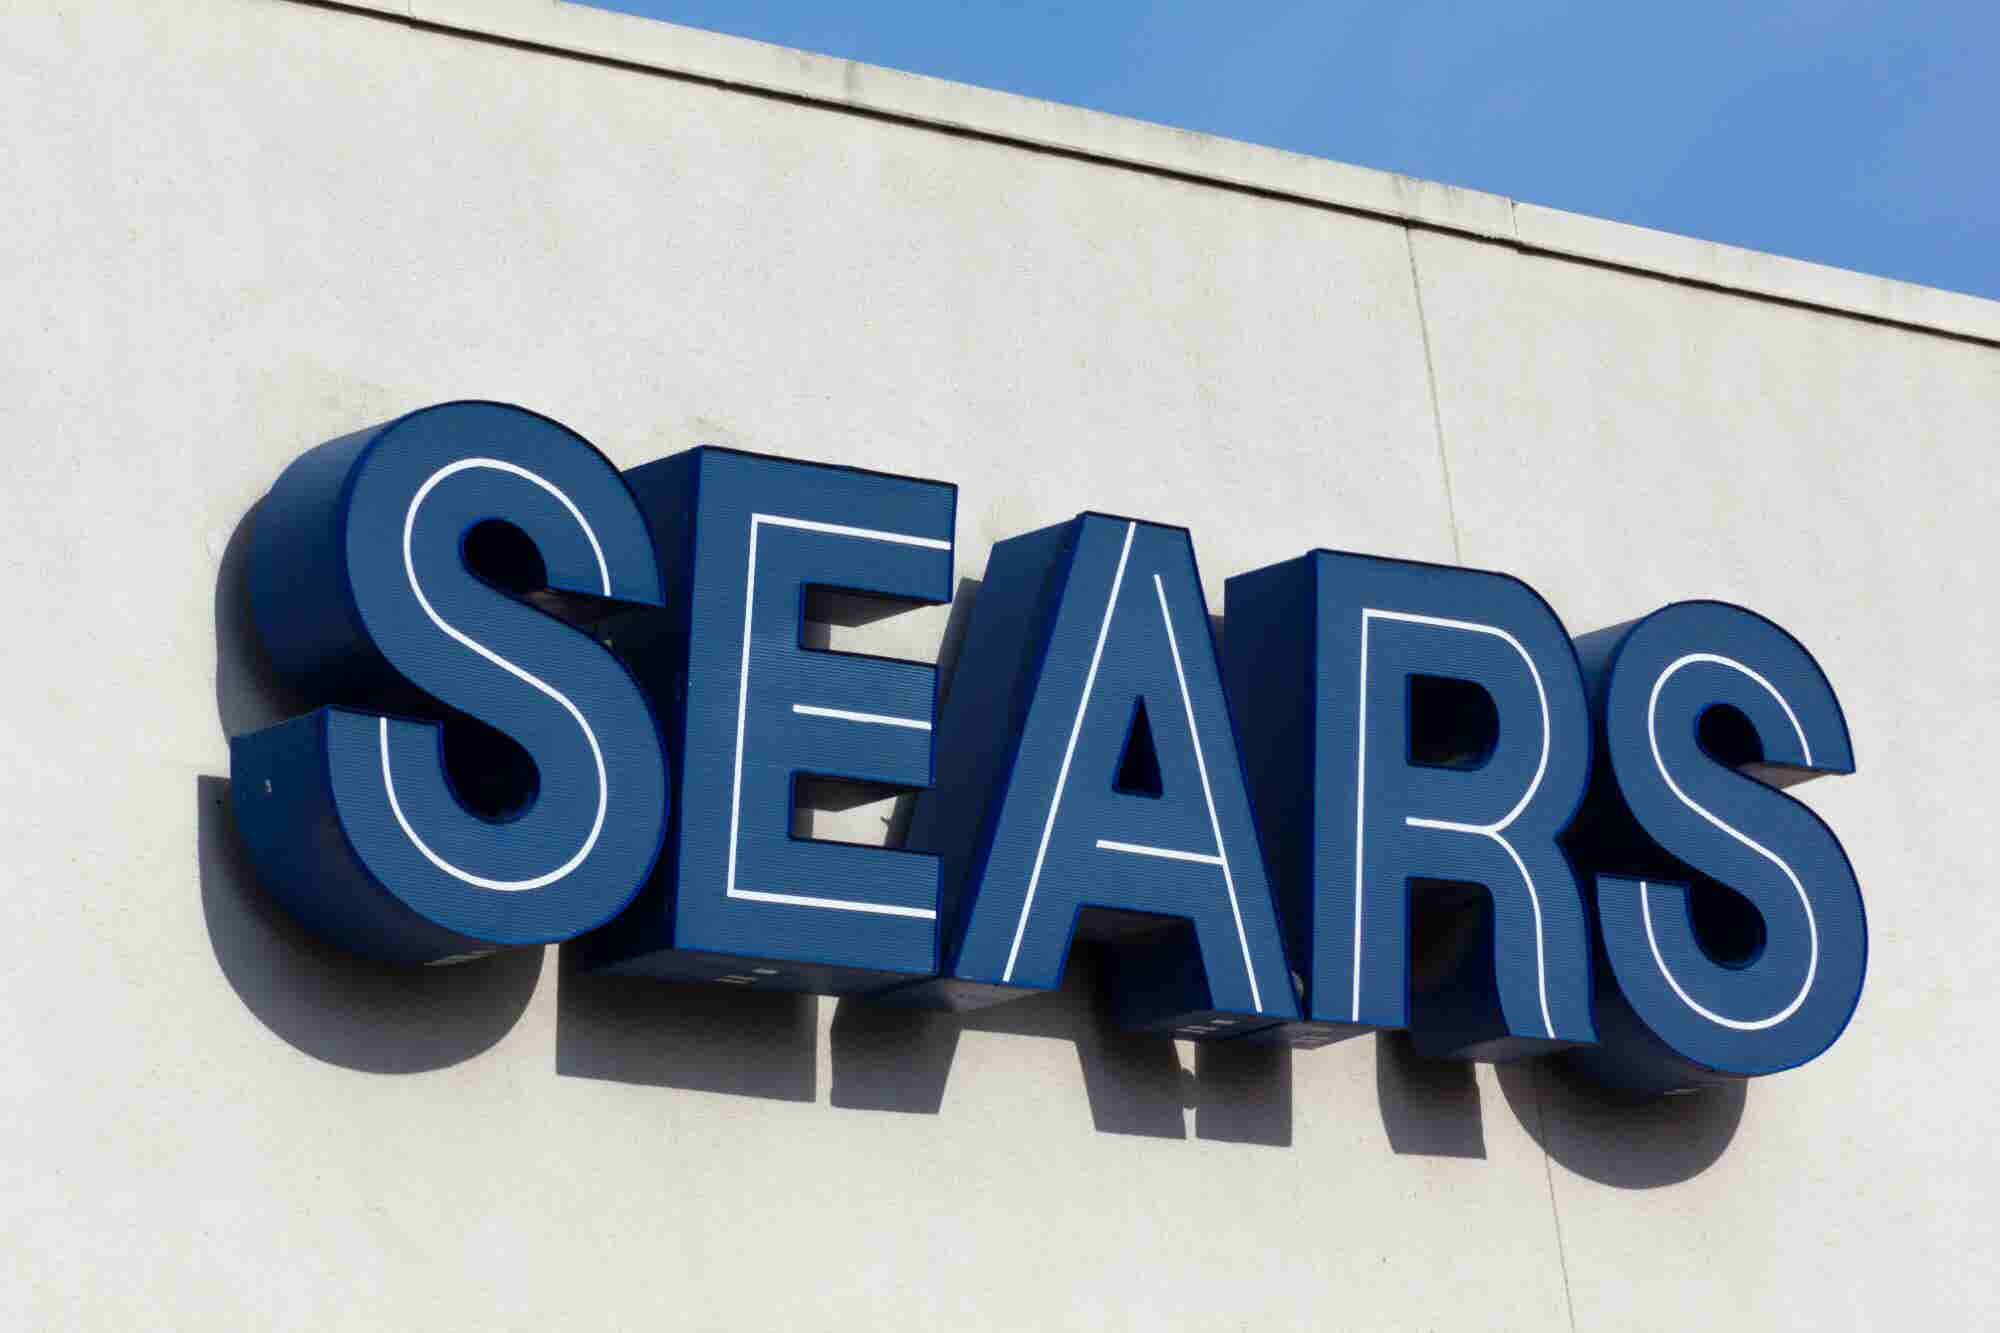 ¿Se acabó? Este fue el error fatal que 'mató' a Sears EU este lunes